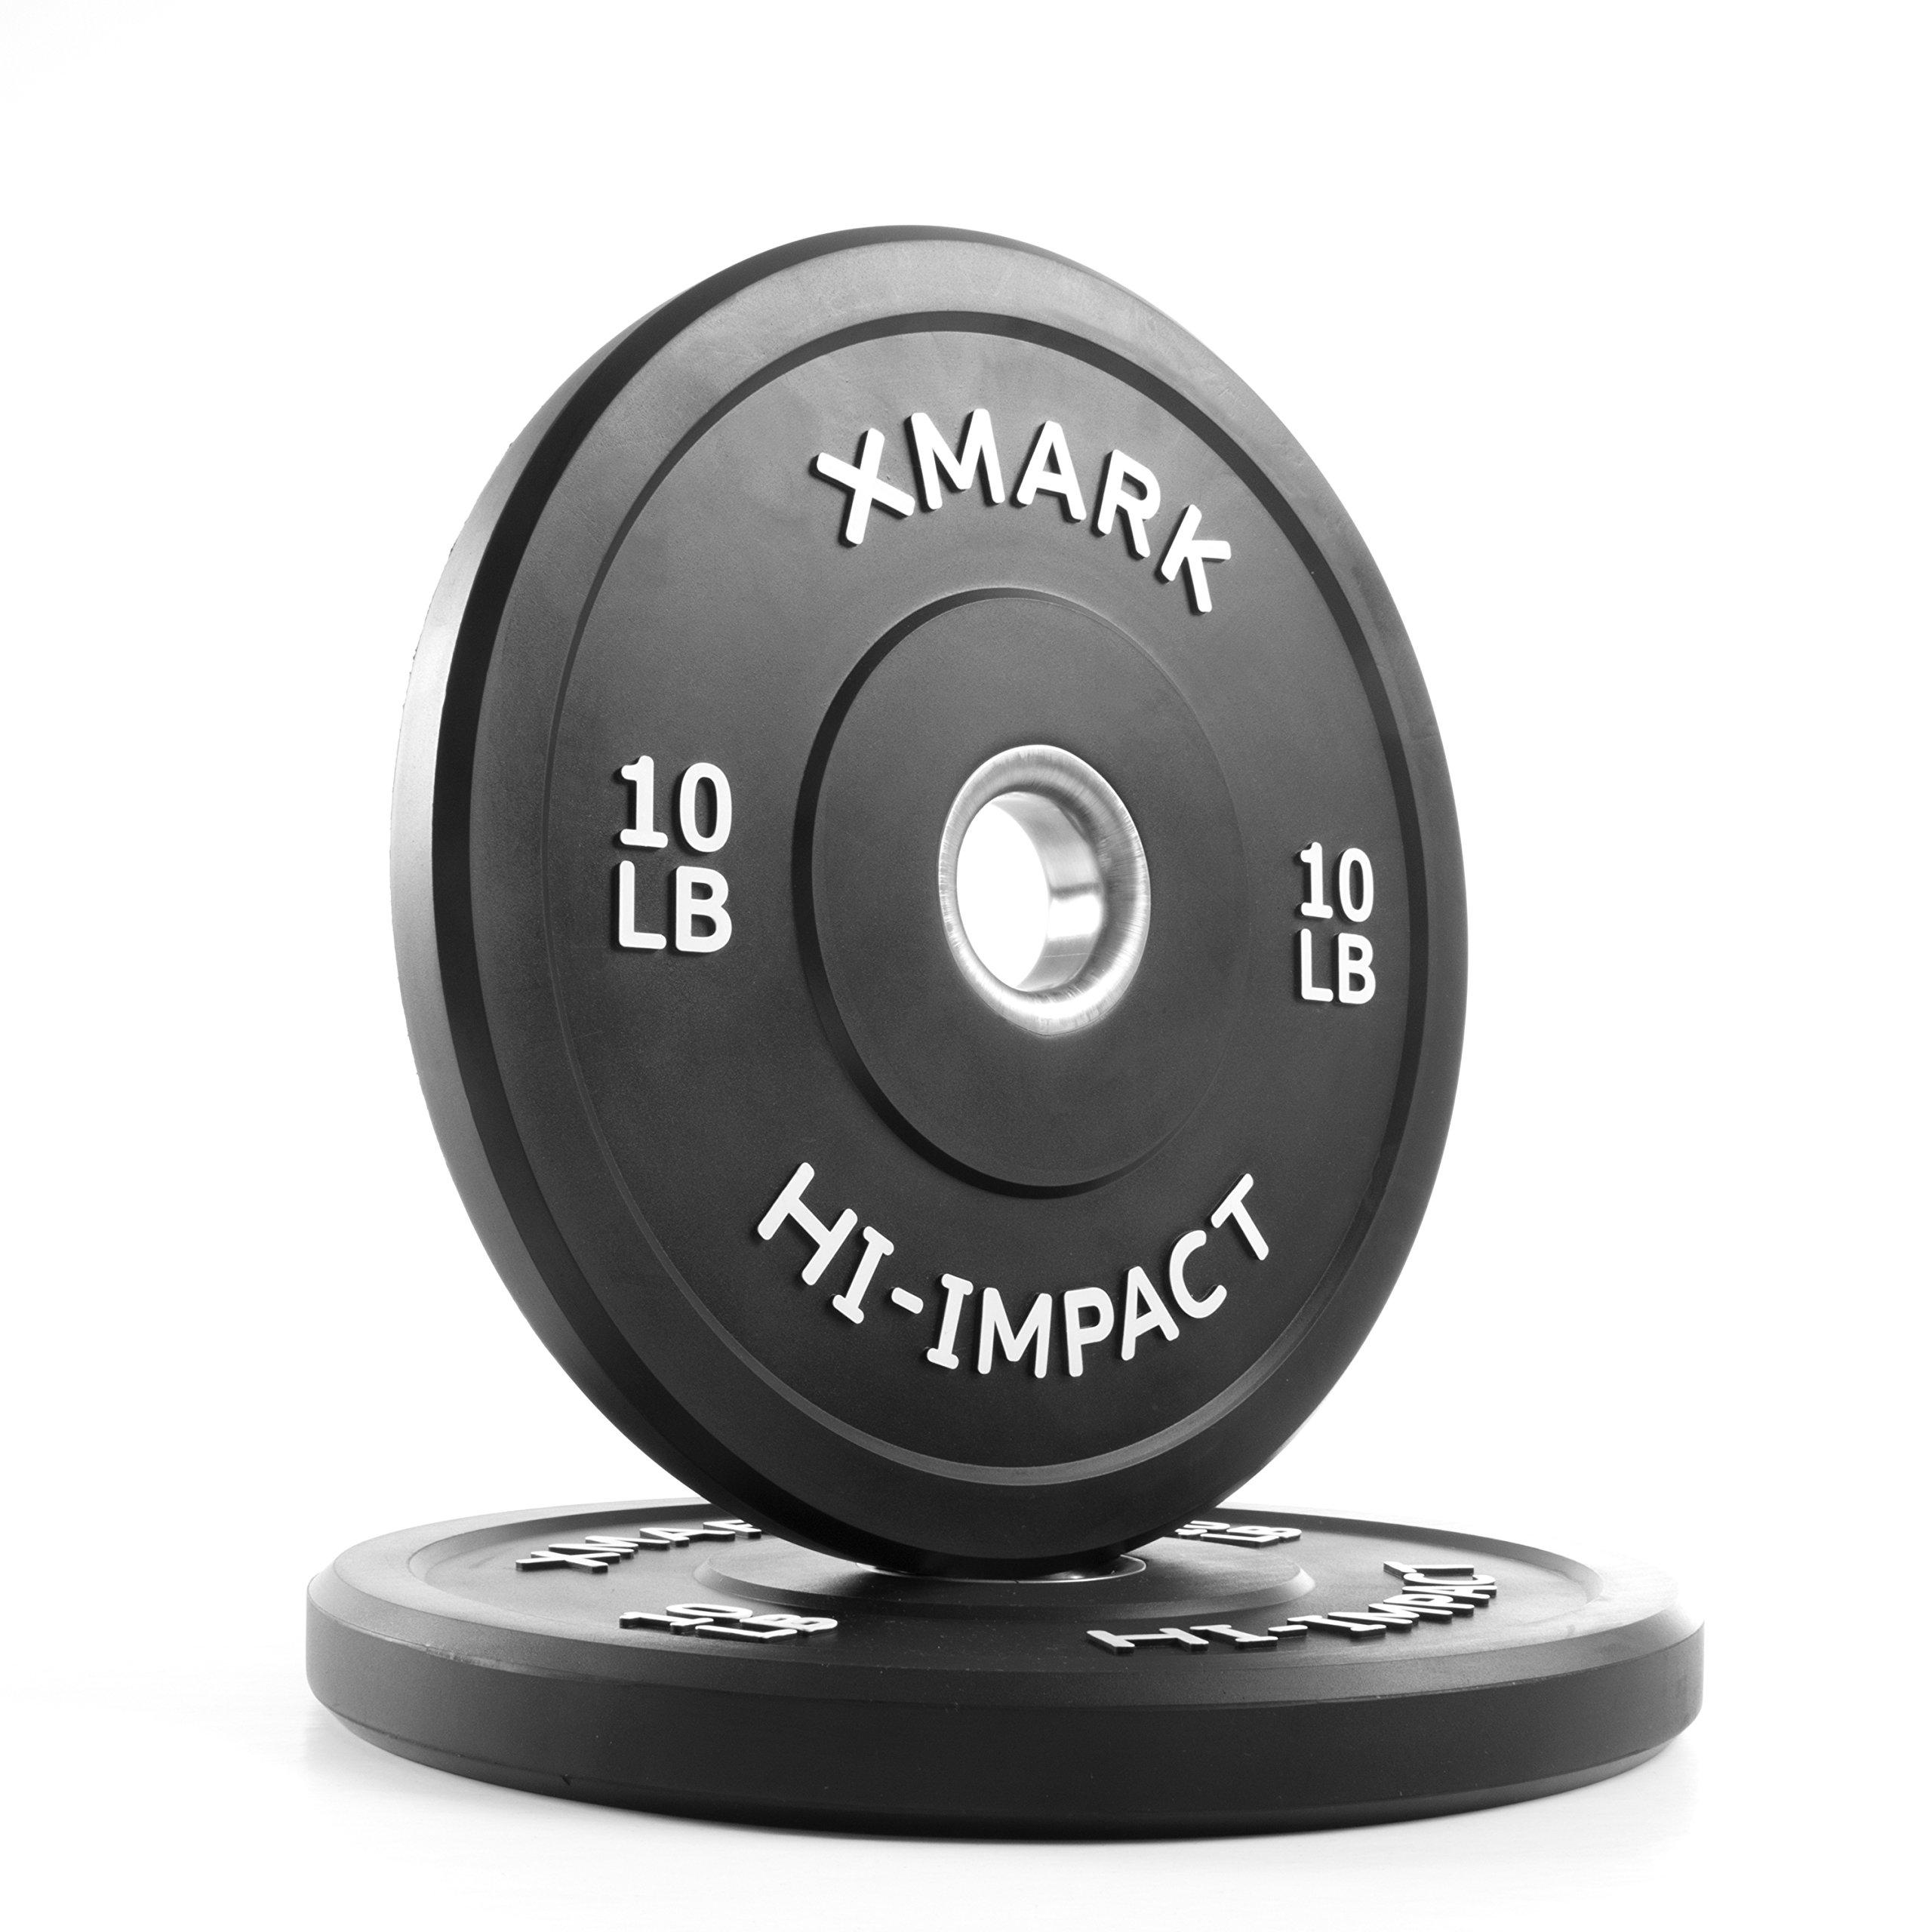 XMark 10 lb Pair Hi-Impact Bumper Plates, Three-Year Warranty, Hi-Impact Dead Bounce Commercial Olympic Bumper Weight Plates, XM-3393